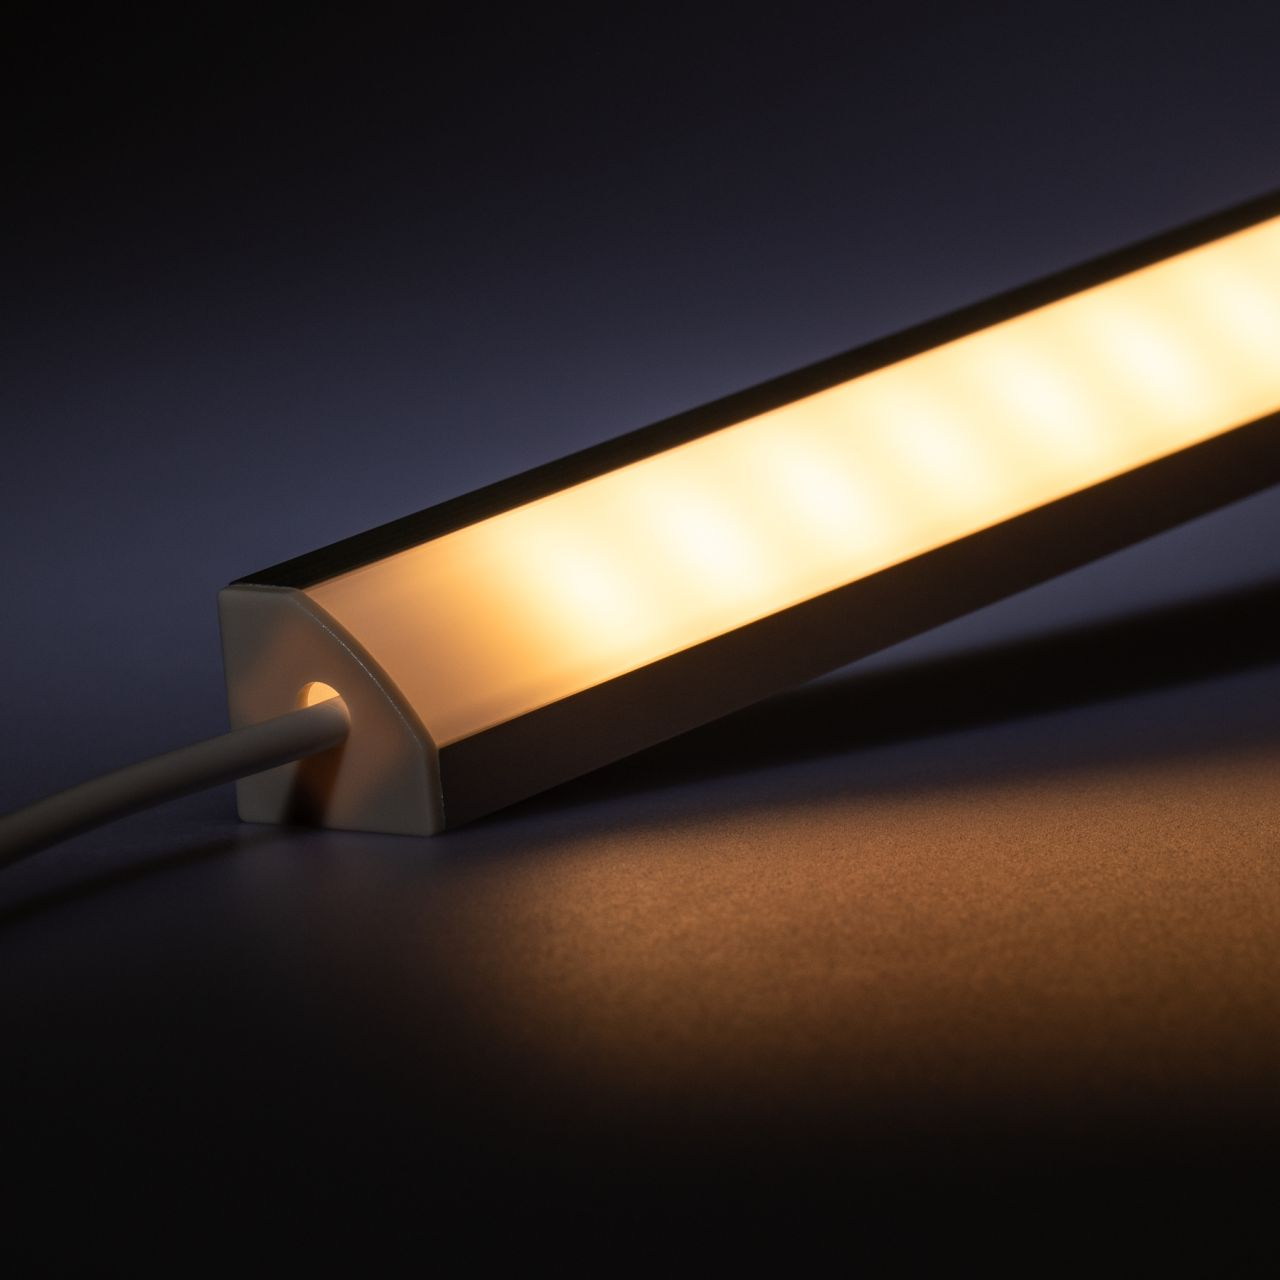 12V Aluminium LED Eckleiste – warmweiß – diffuse Abdeckung